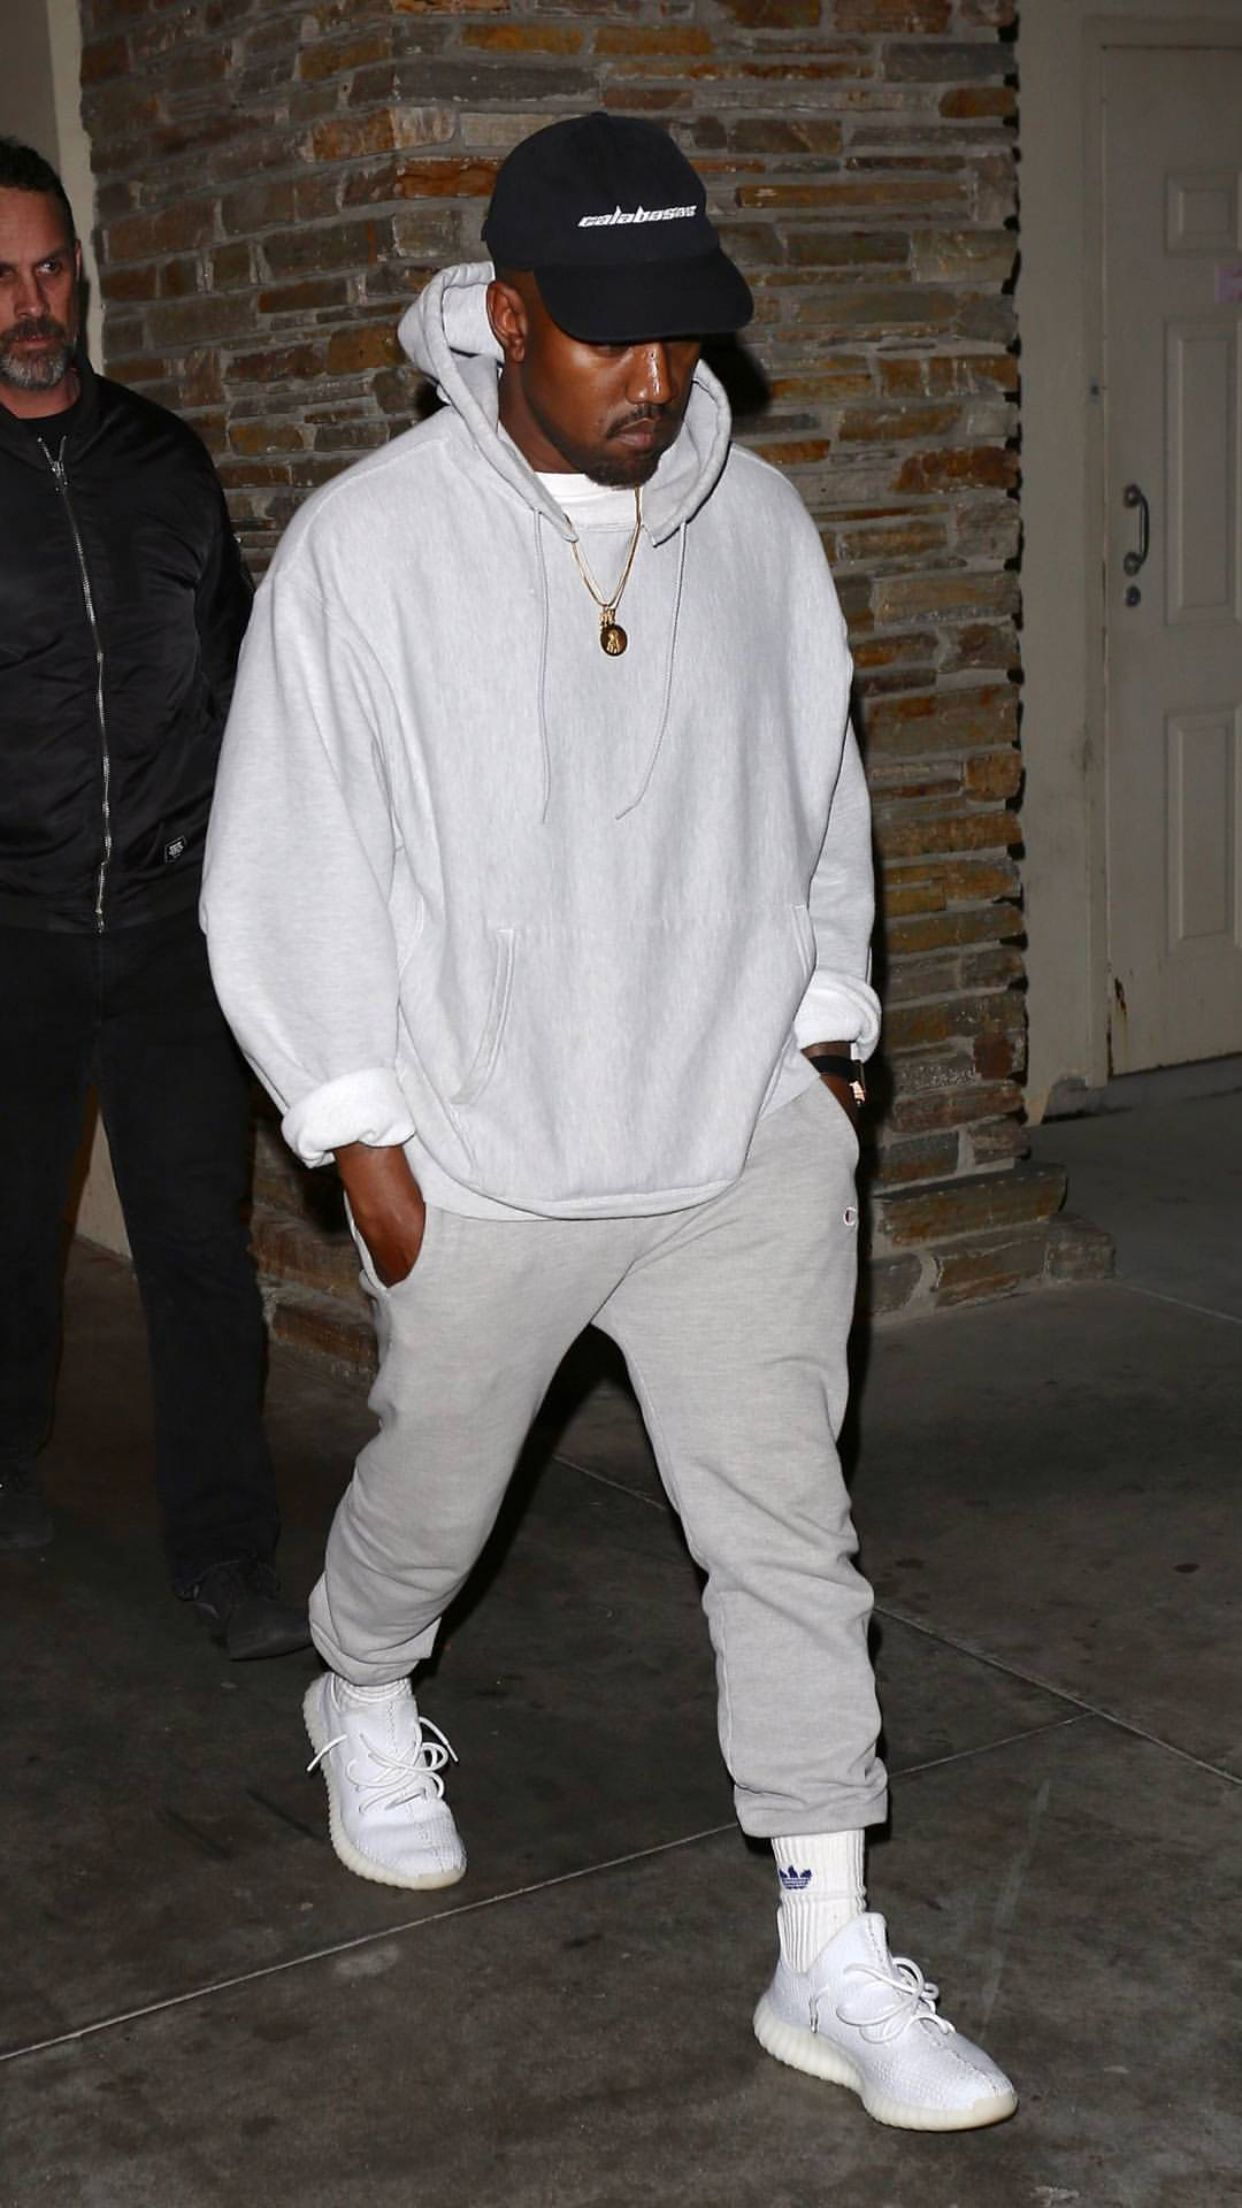 @tuesdaysg0ne | `ᵐᵉᶰ ʷᵉᵃʳ, 2019 | Yeezy fashion, Kanye ...